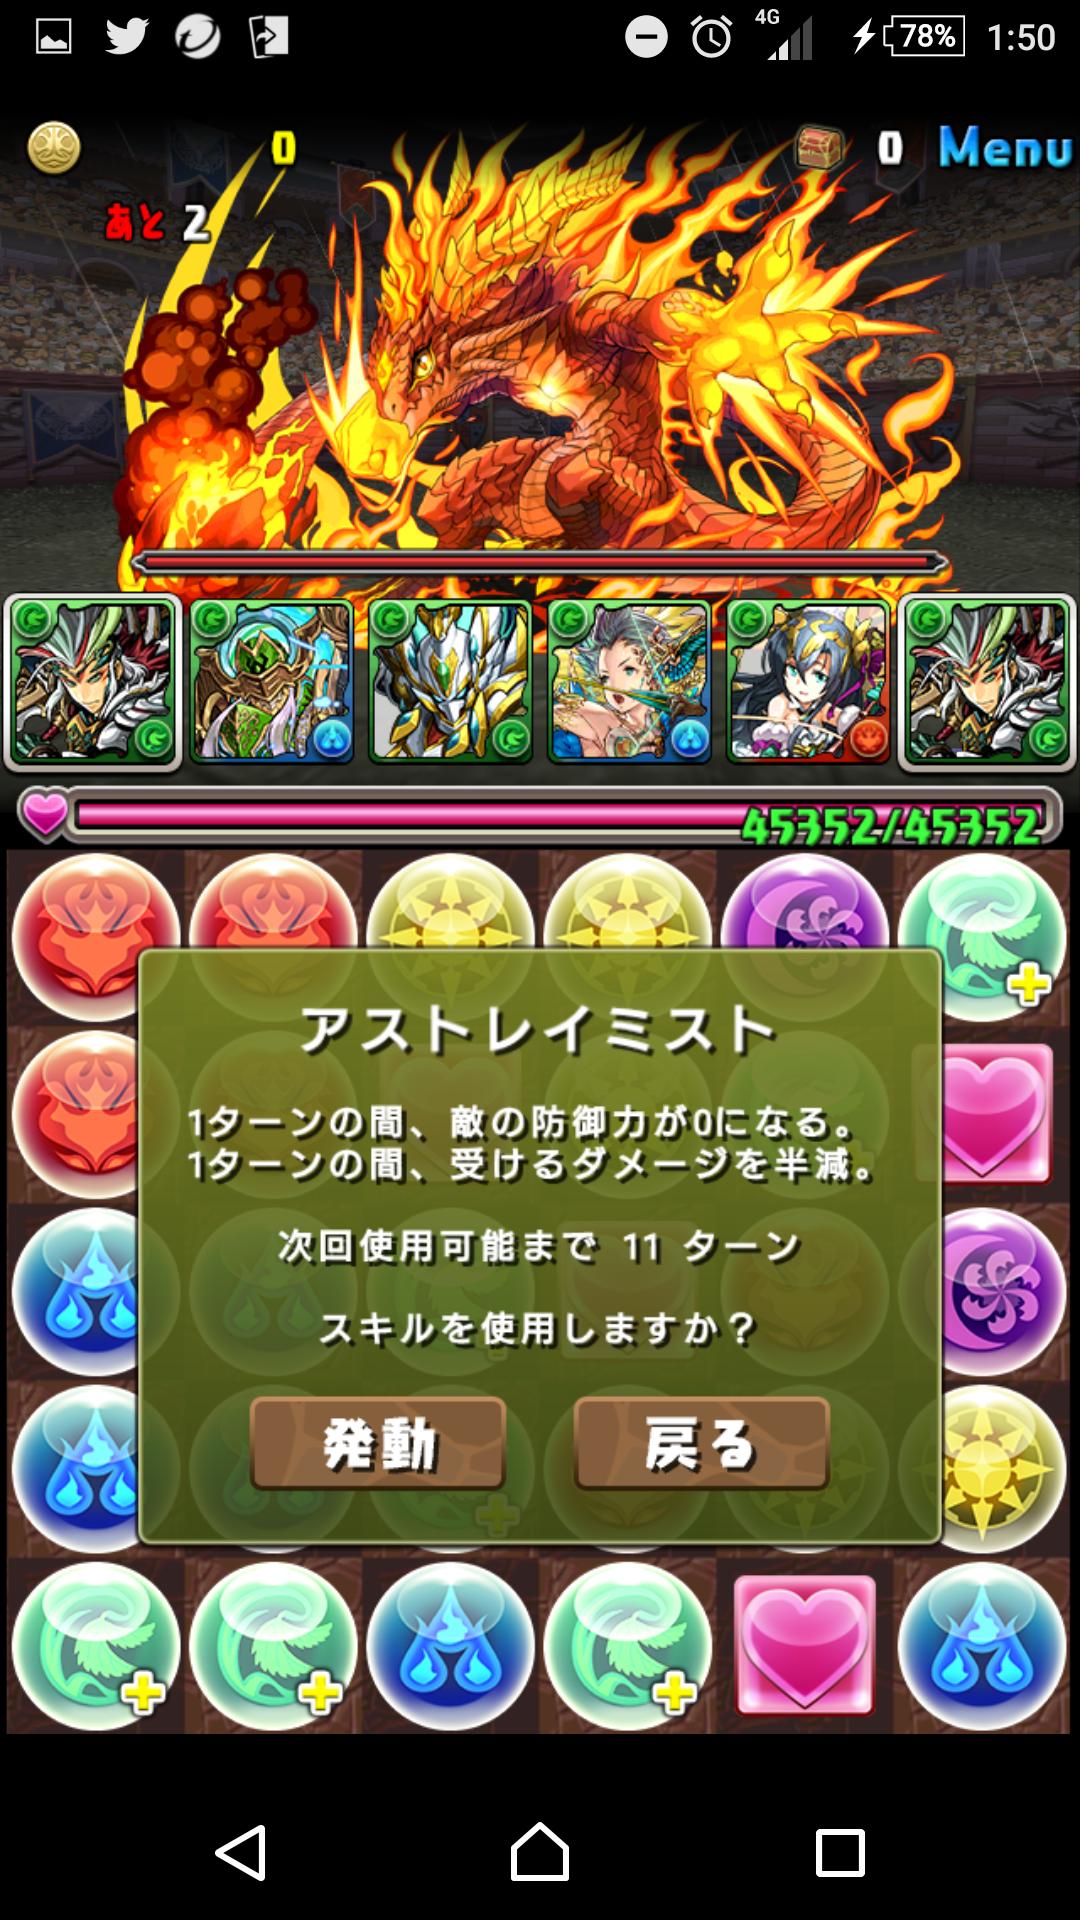 Screenshot_20160725-015038.png